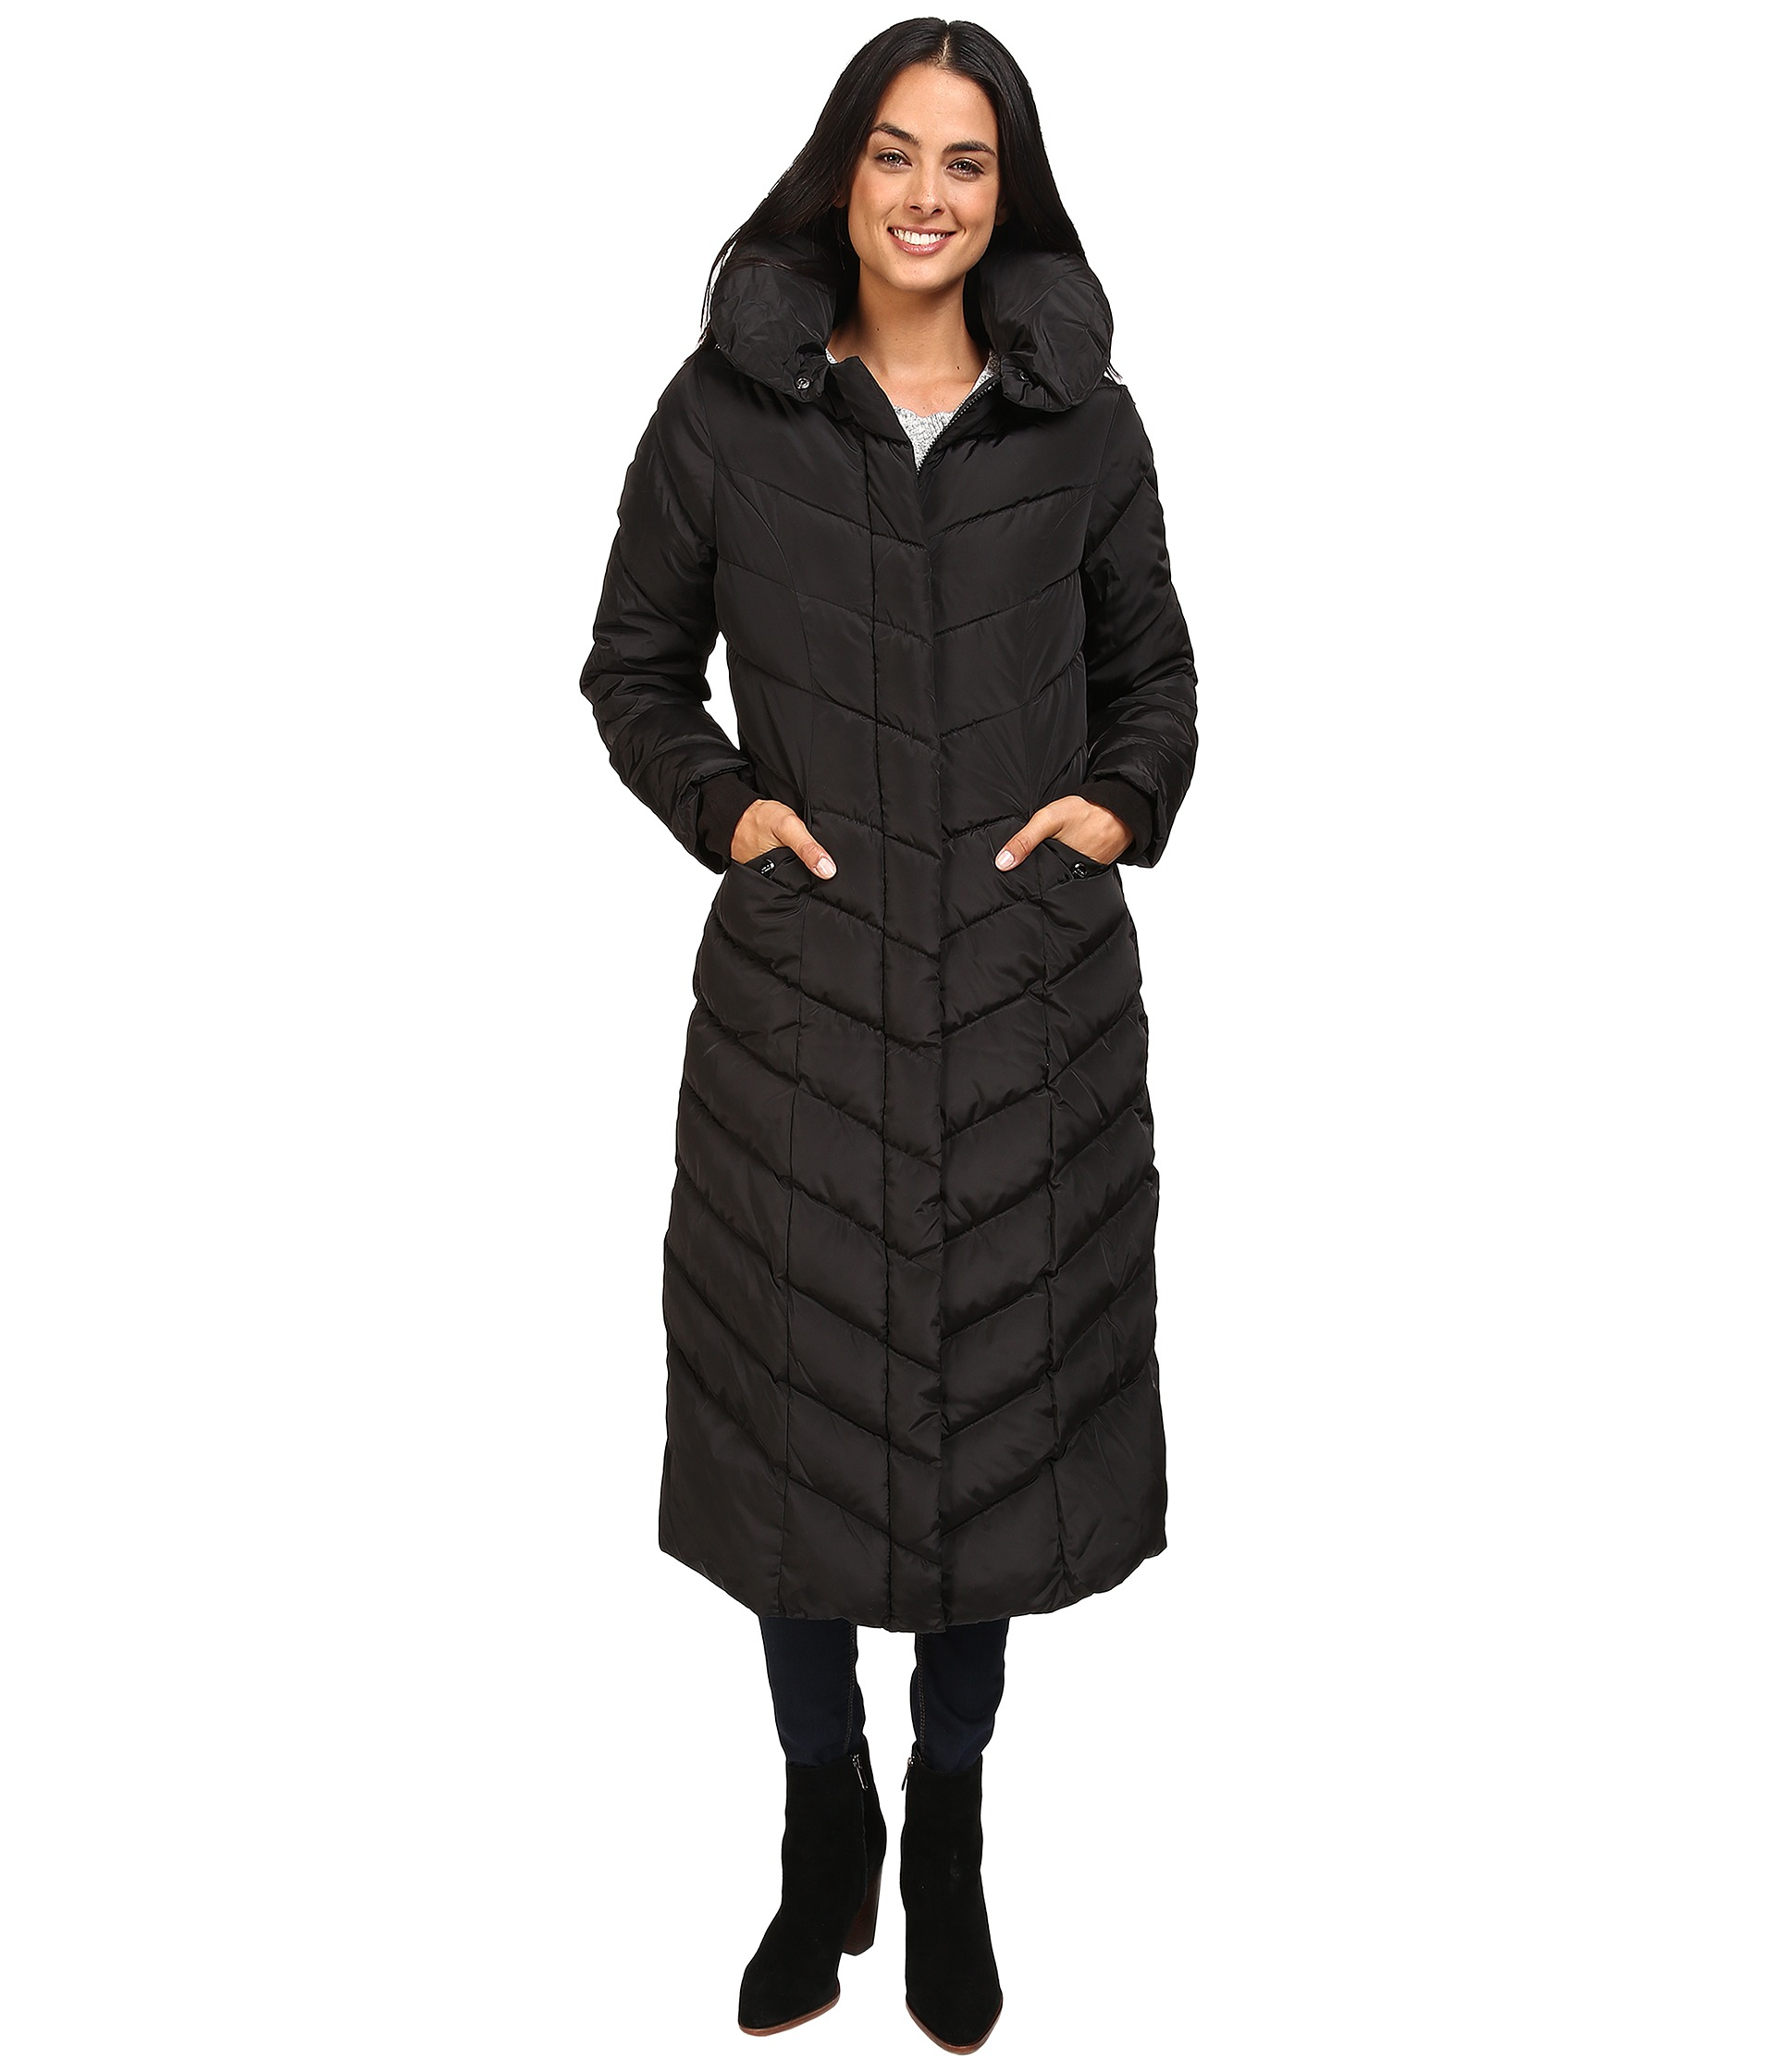 671c2fdd87f ... Steve Madden Women s Maxi Hooded Chevron Puffer Coat - Black - Size   Medium ...